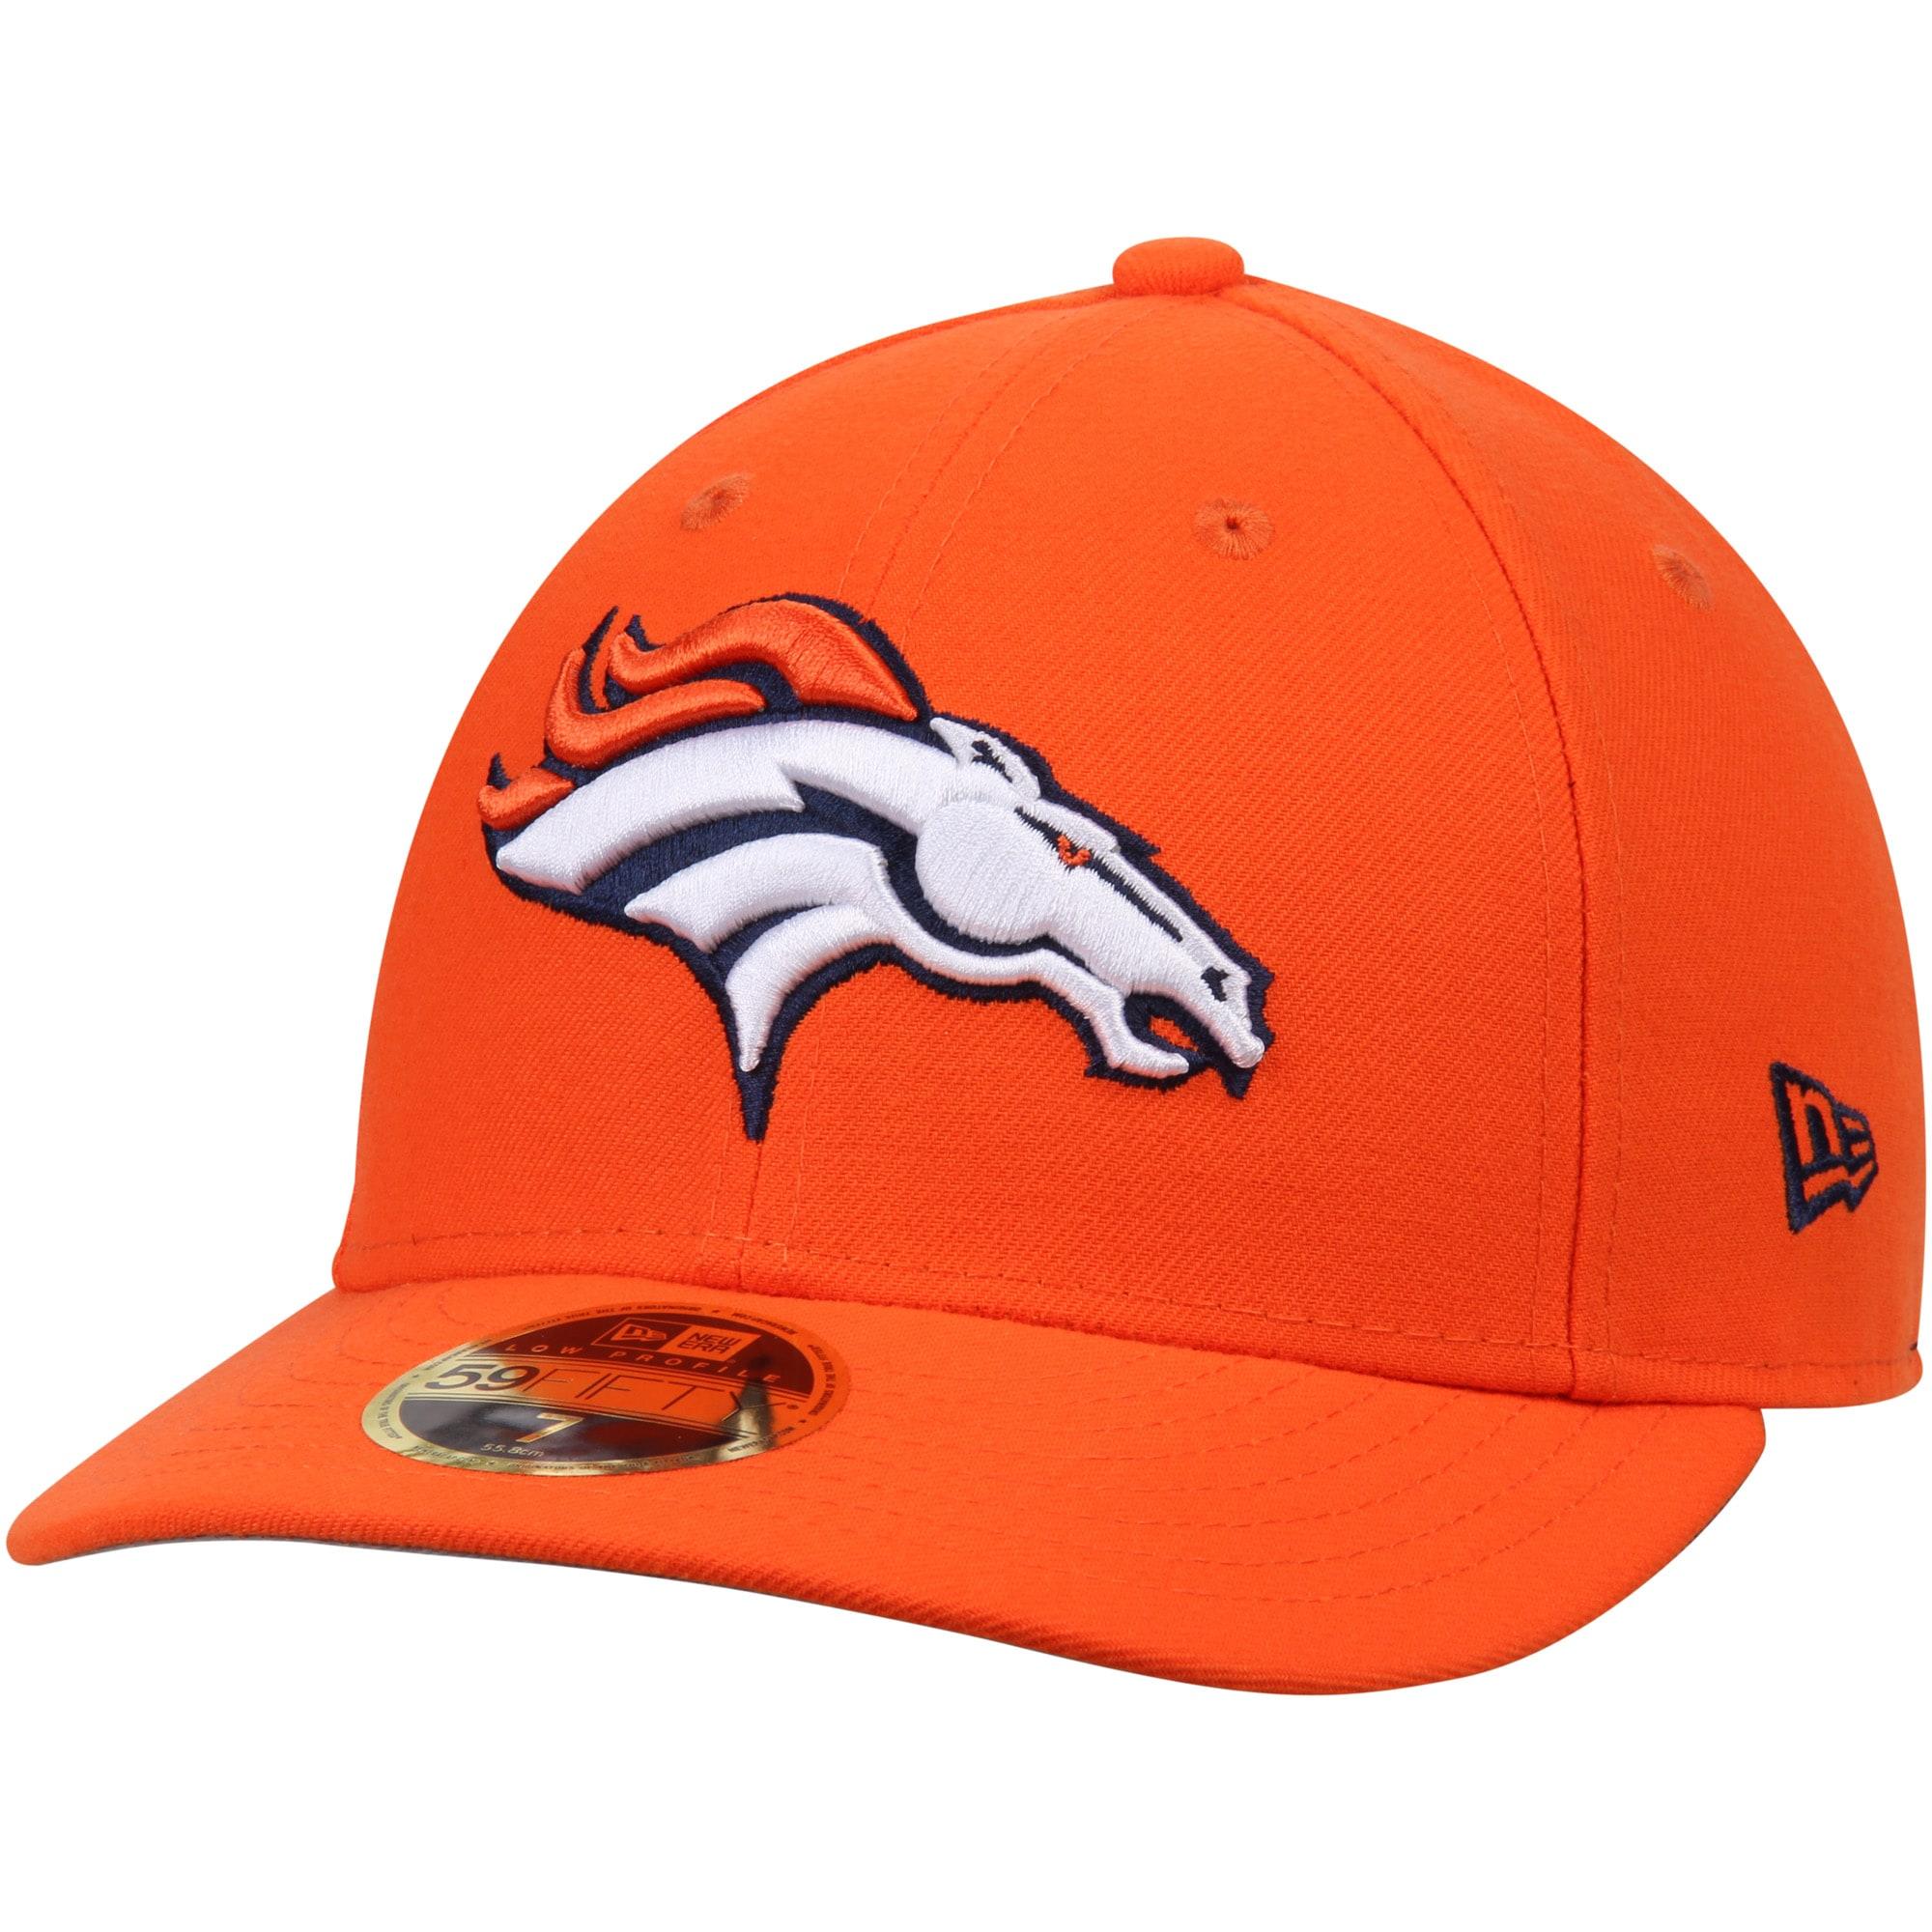 Denver Broncos New Era Omaha Low Profile 59FIFTY Structured Hat - Orange